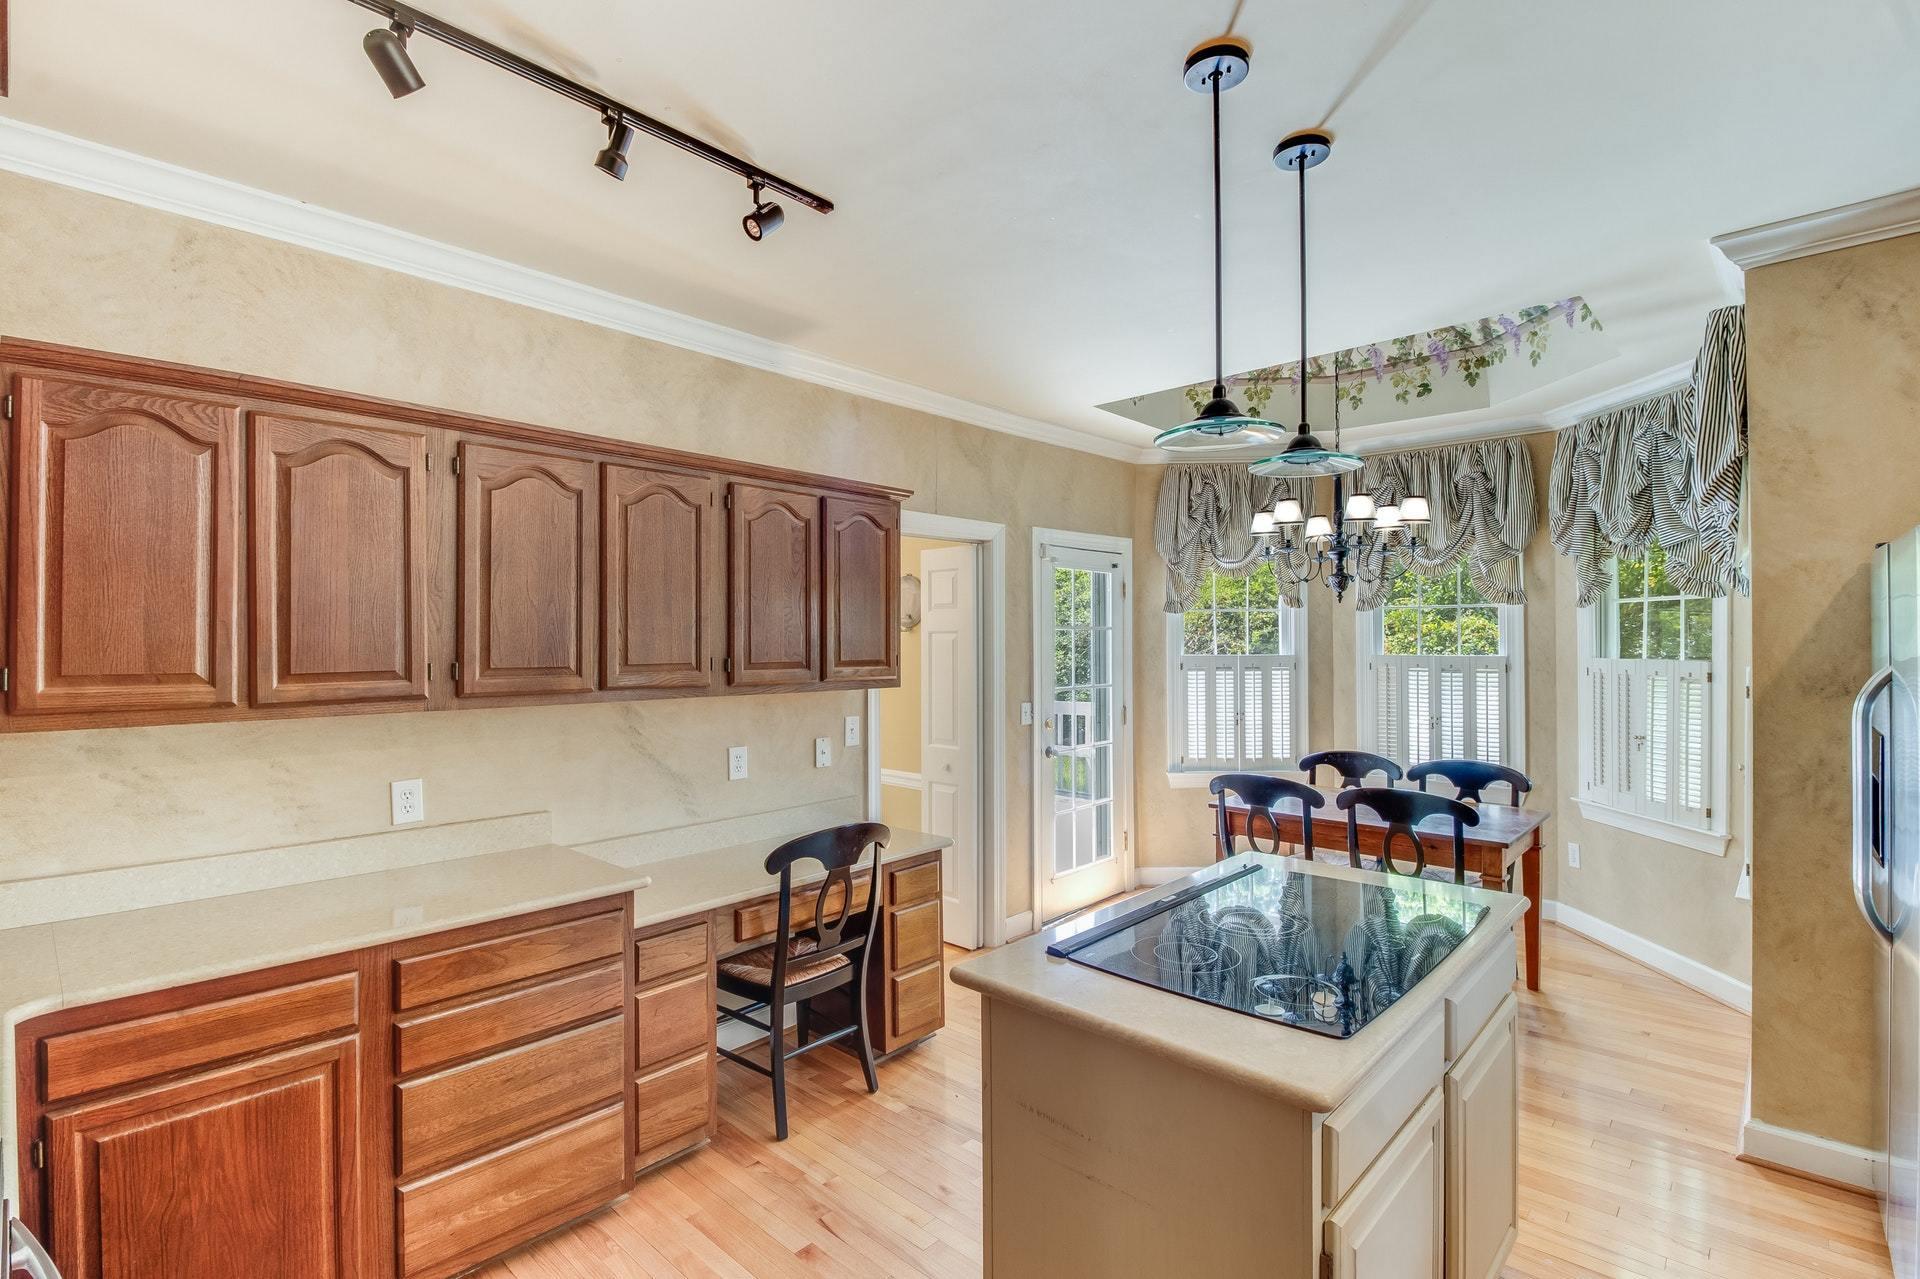 Molasses Creek Homes For Sale - 396 Sirop, Mount Pleasant, SC - 12